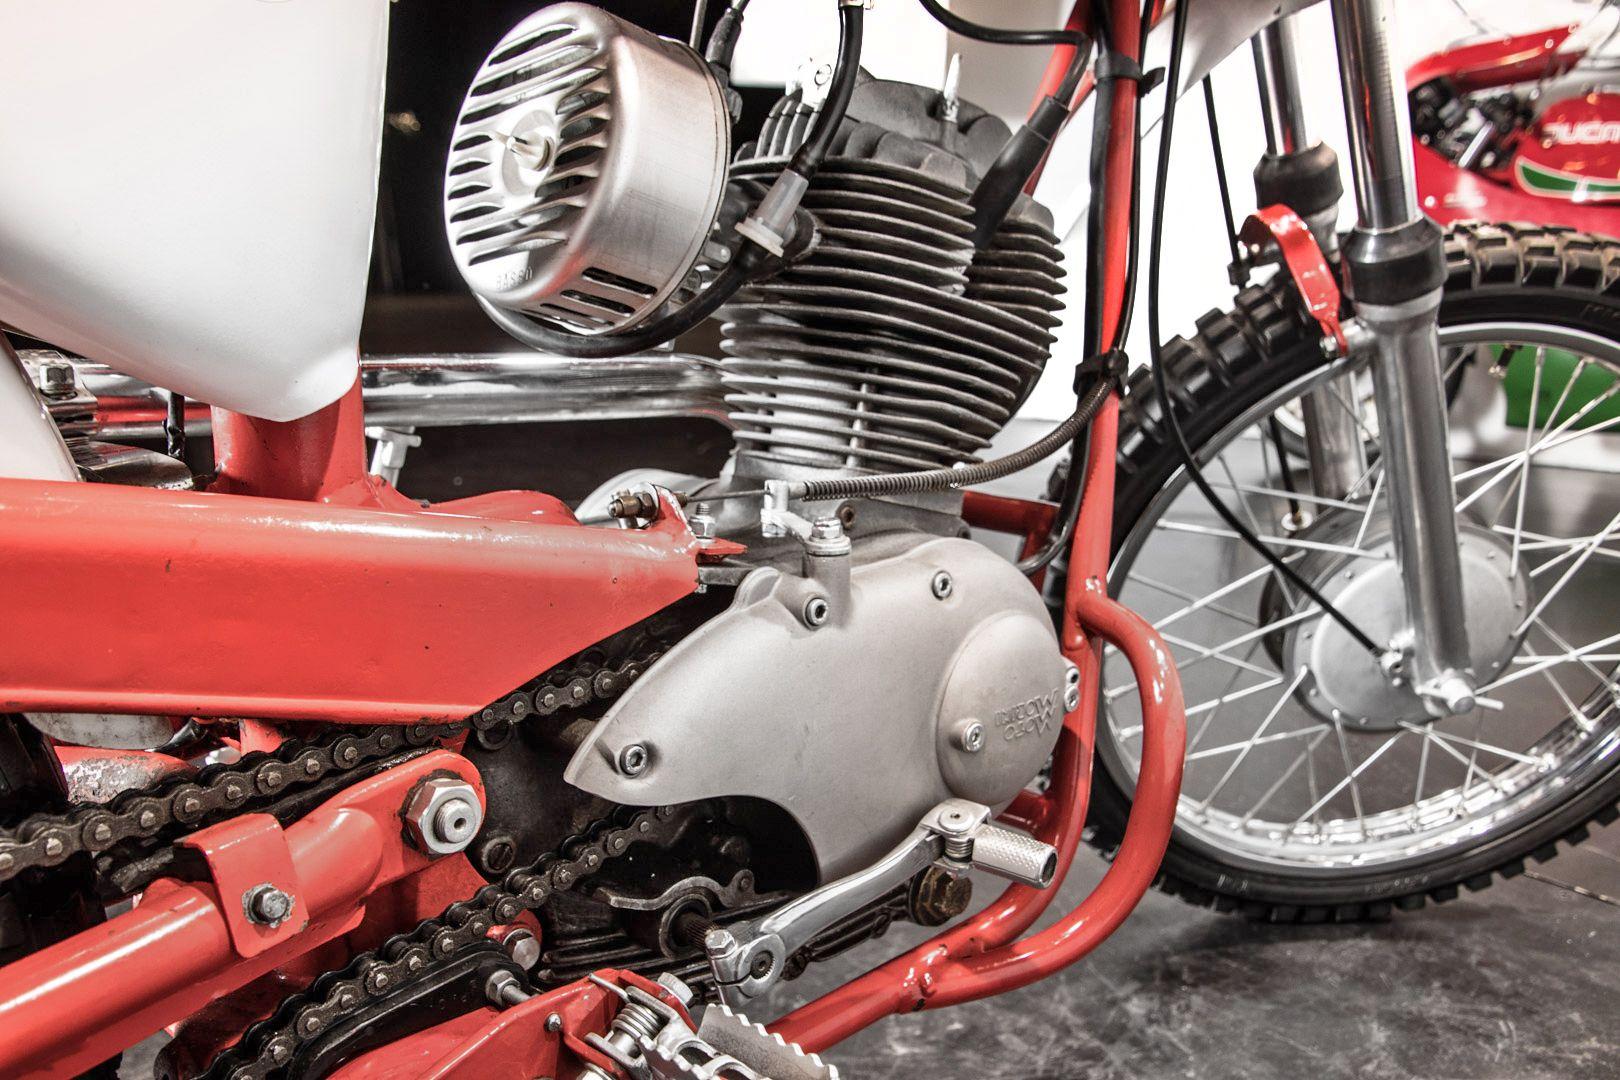 1959 Moto Morini Corsaro 125 37765